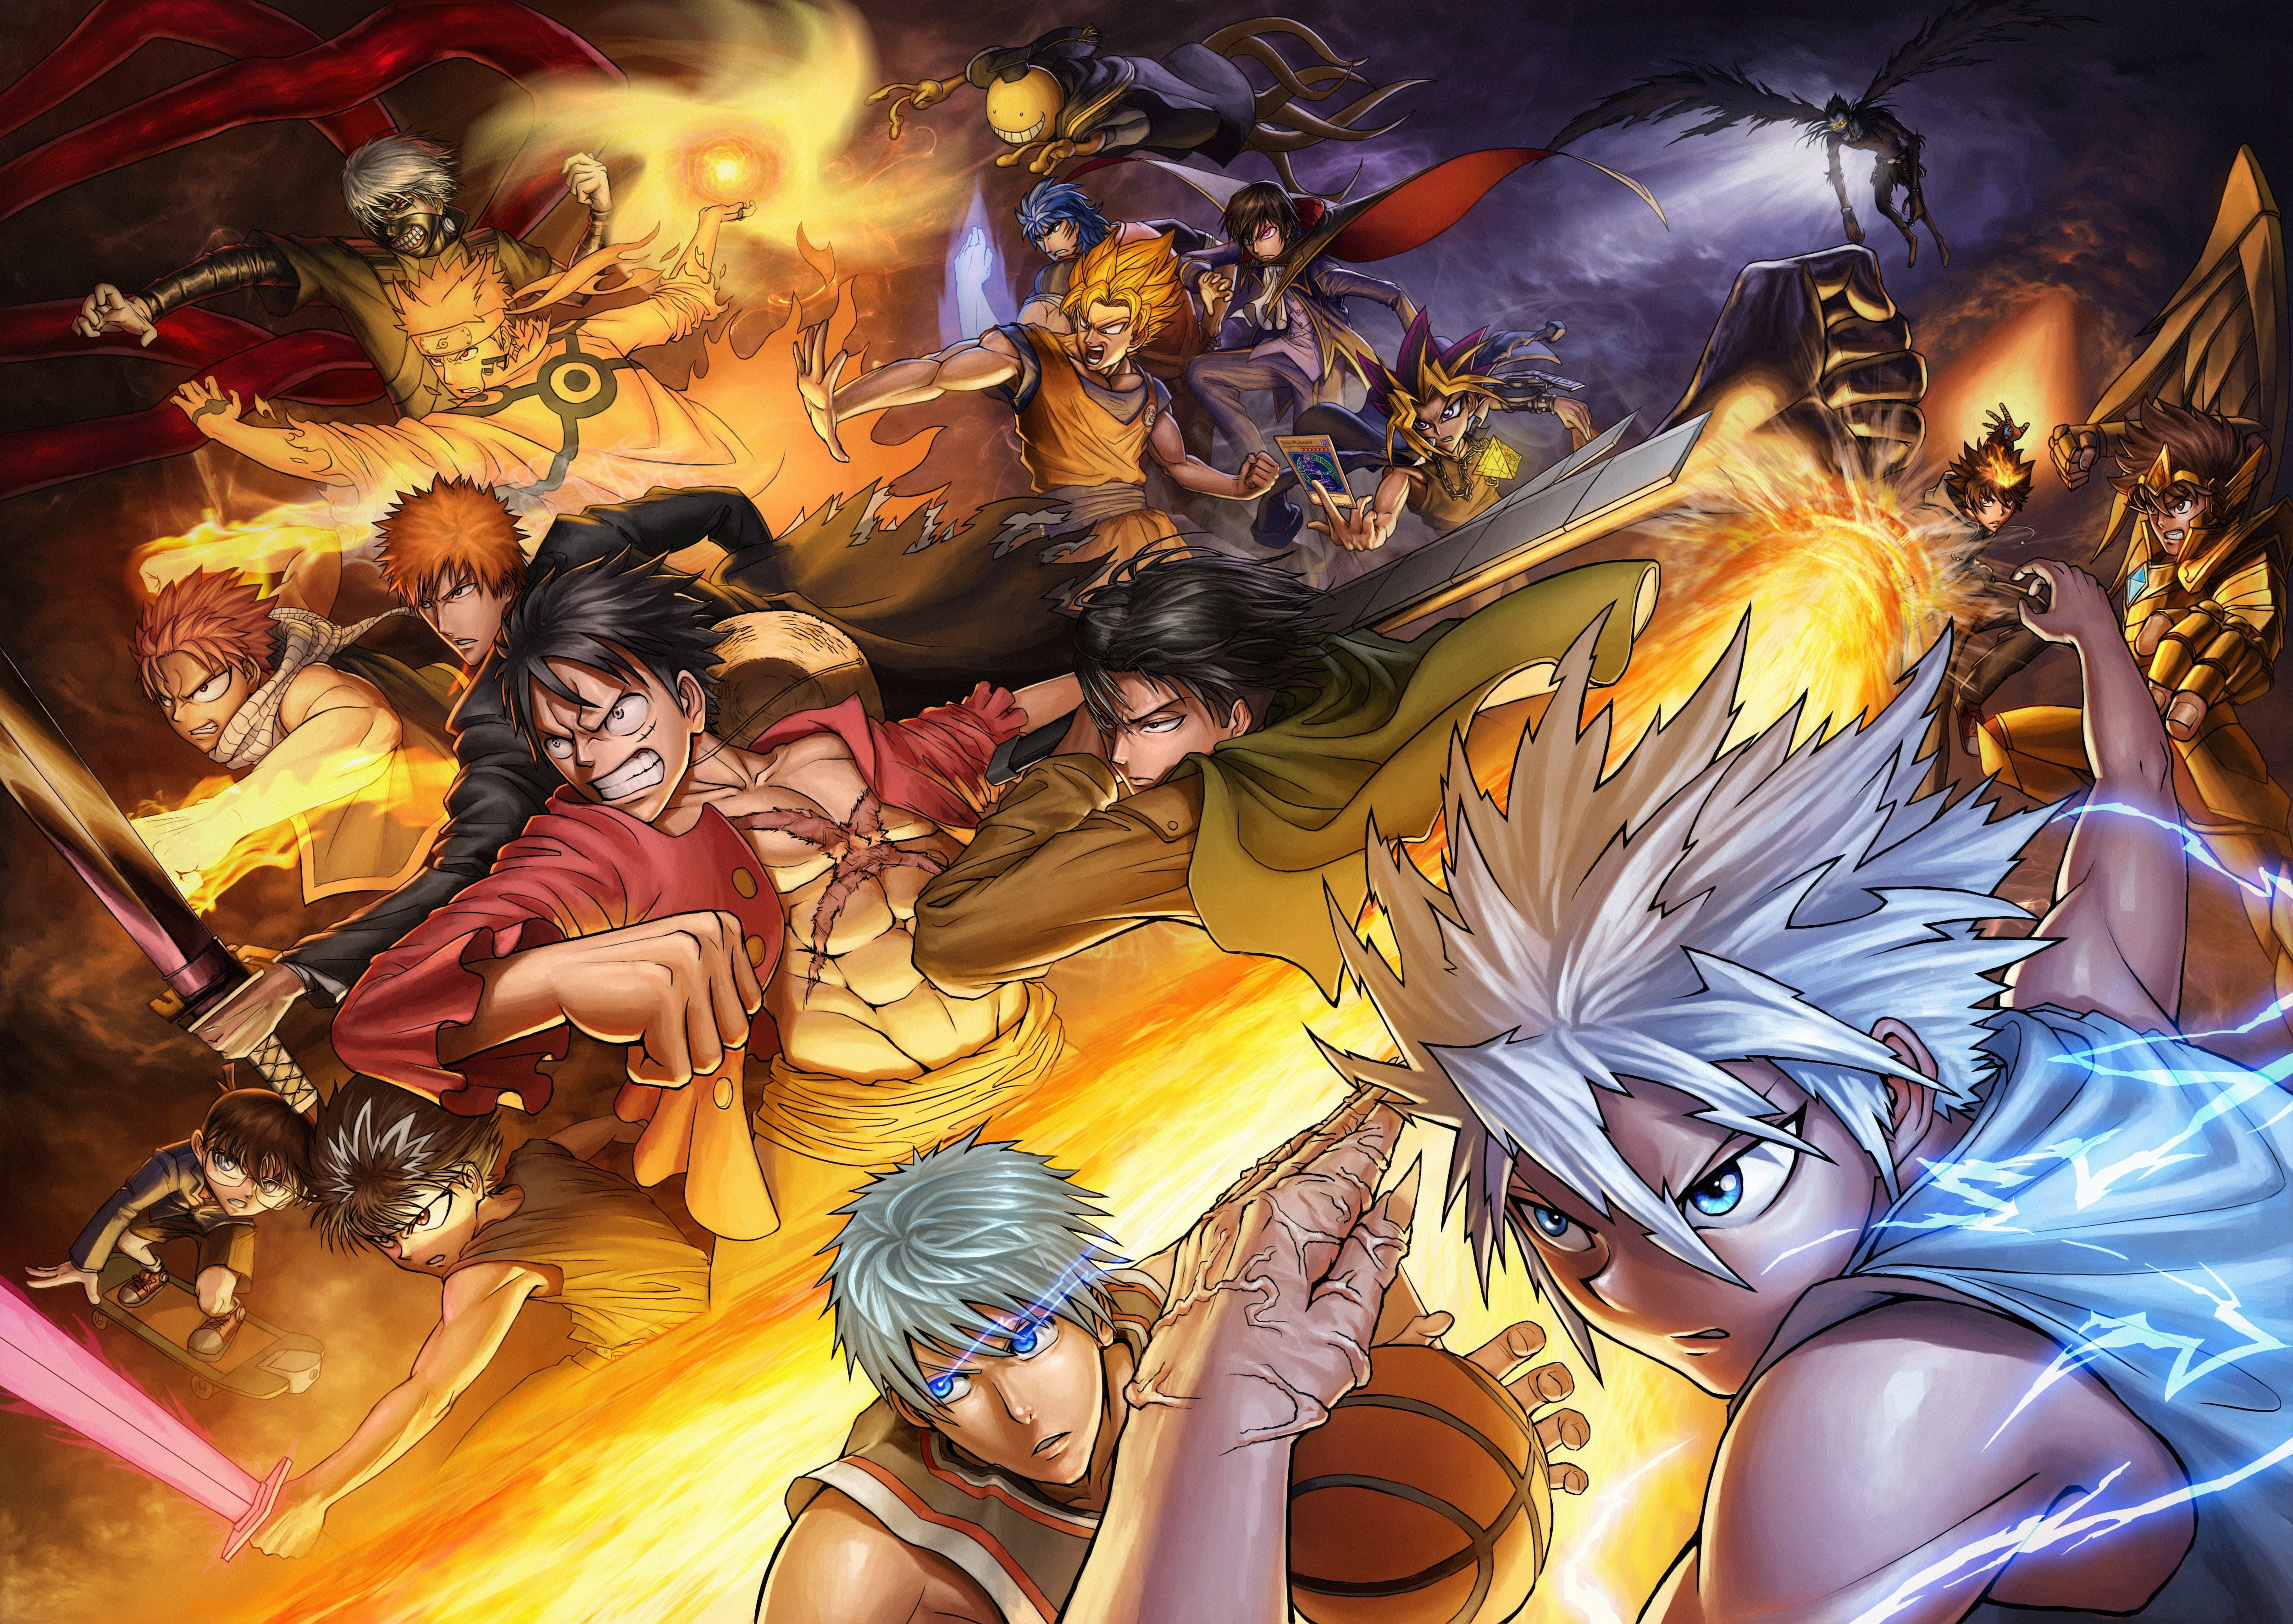 Anime compilation wallpaper HD wallpaper Wallpaper Flare 5000x3541